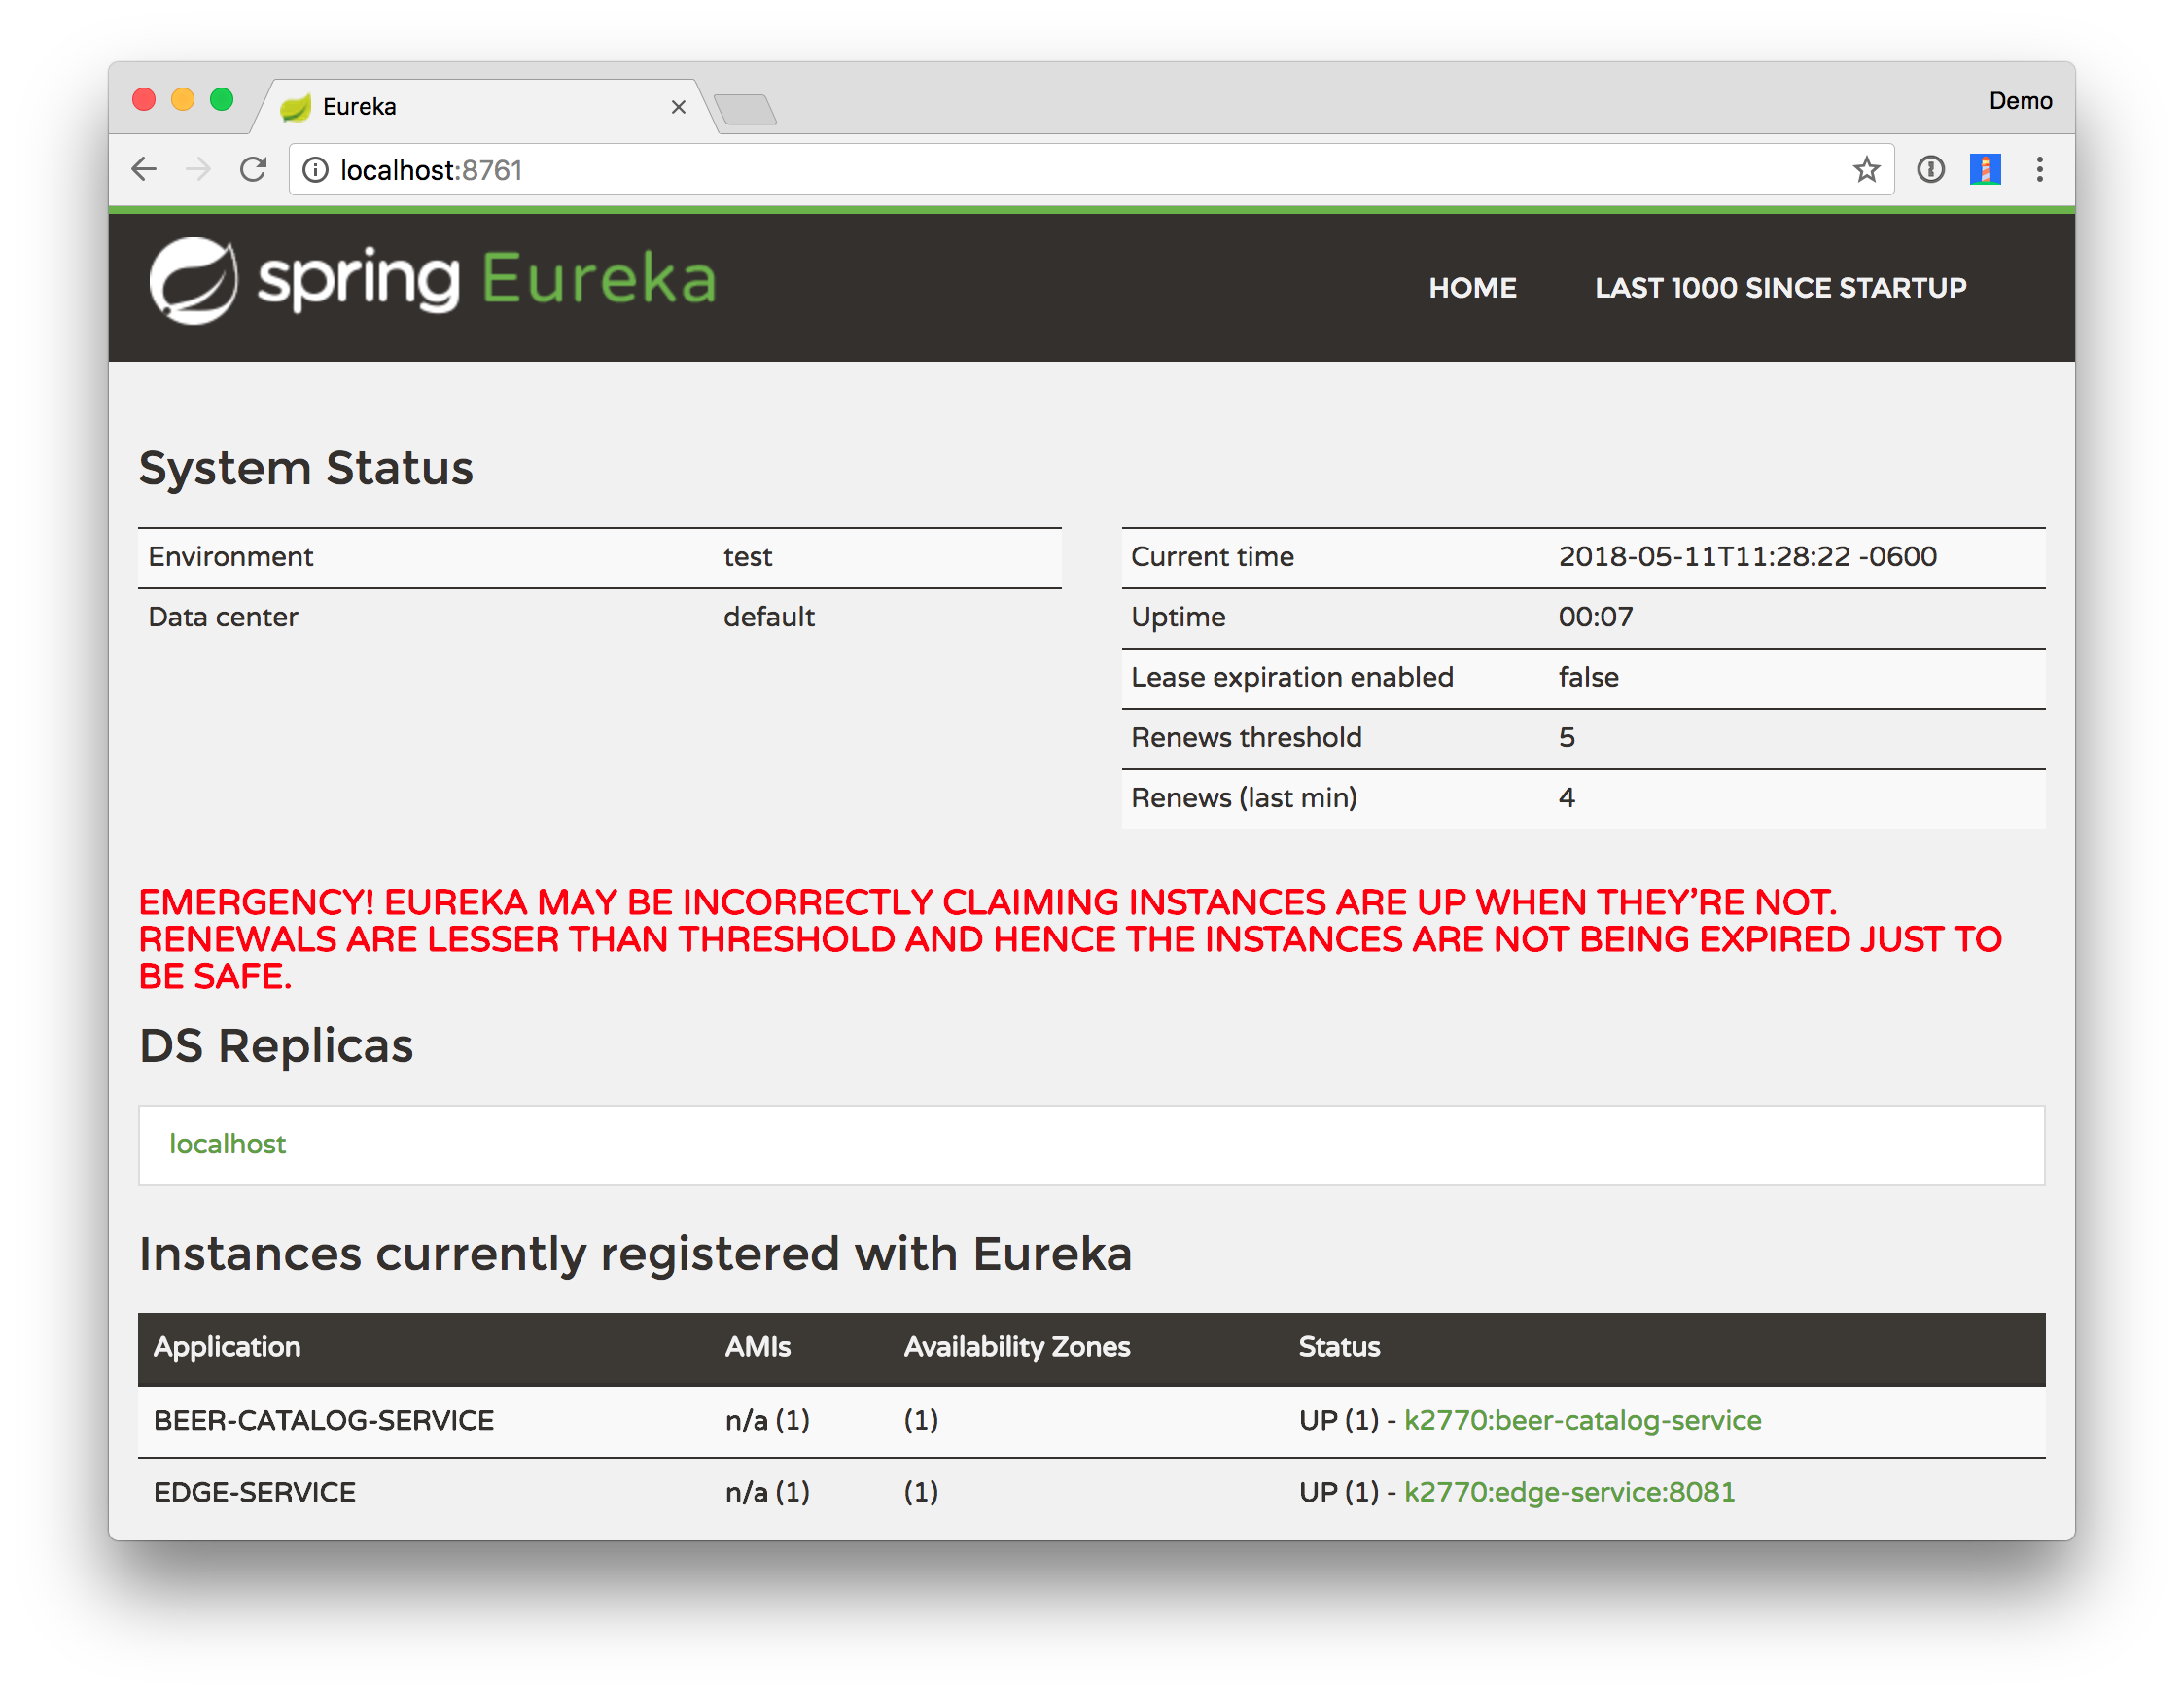 Edge Service Registered